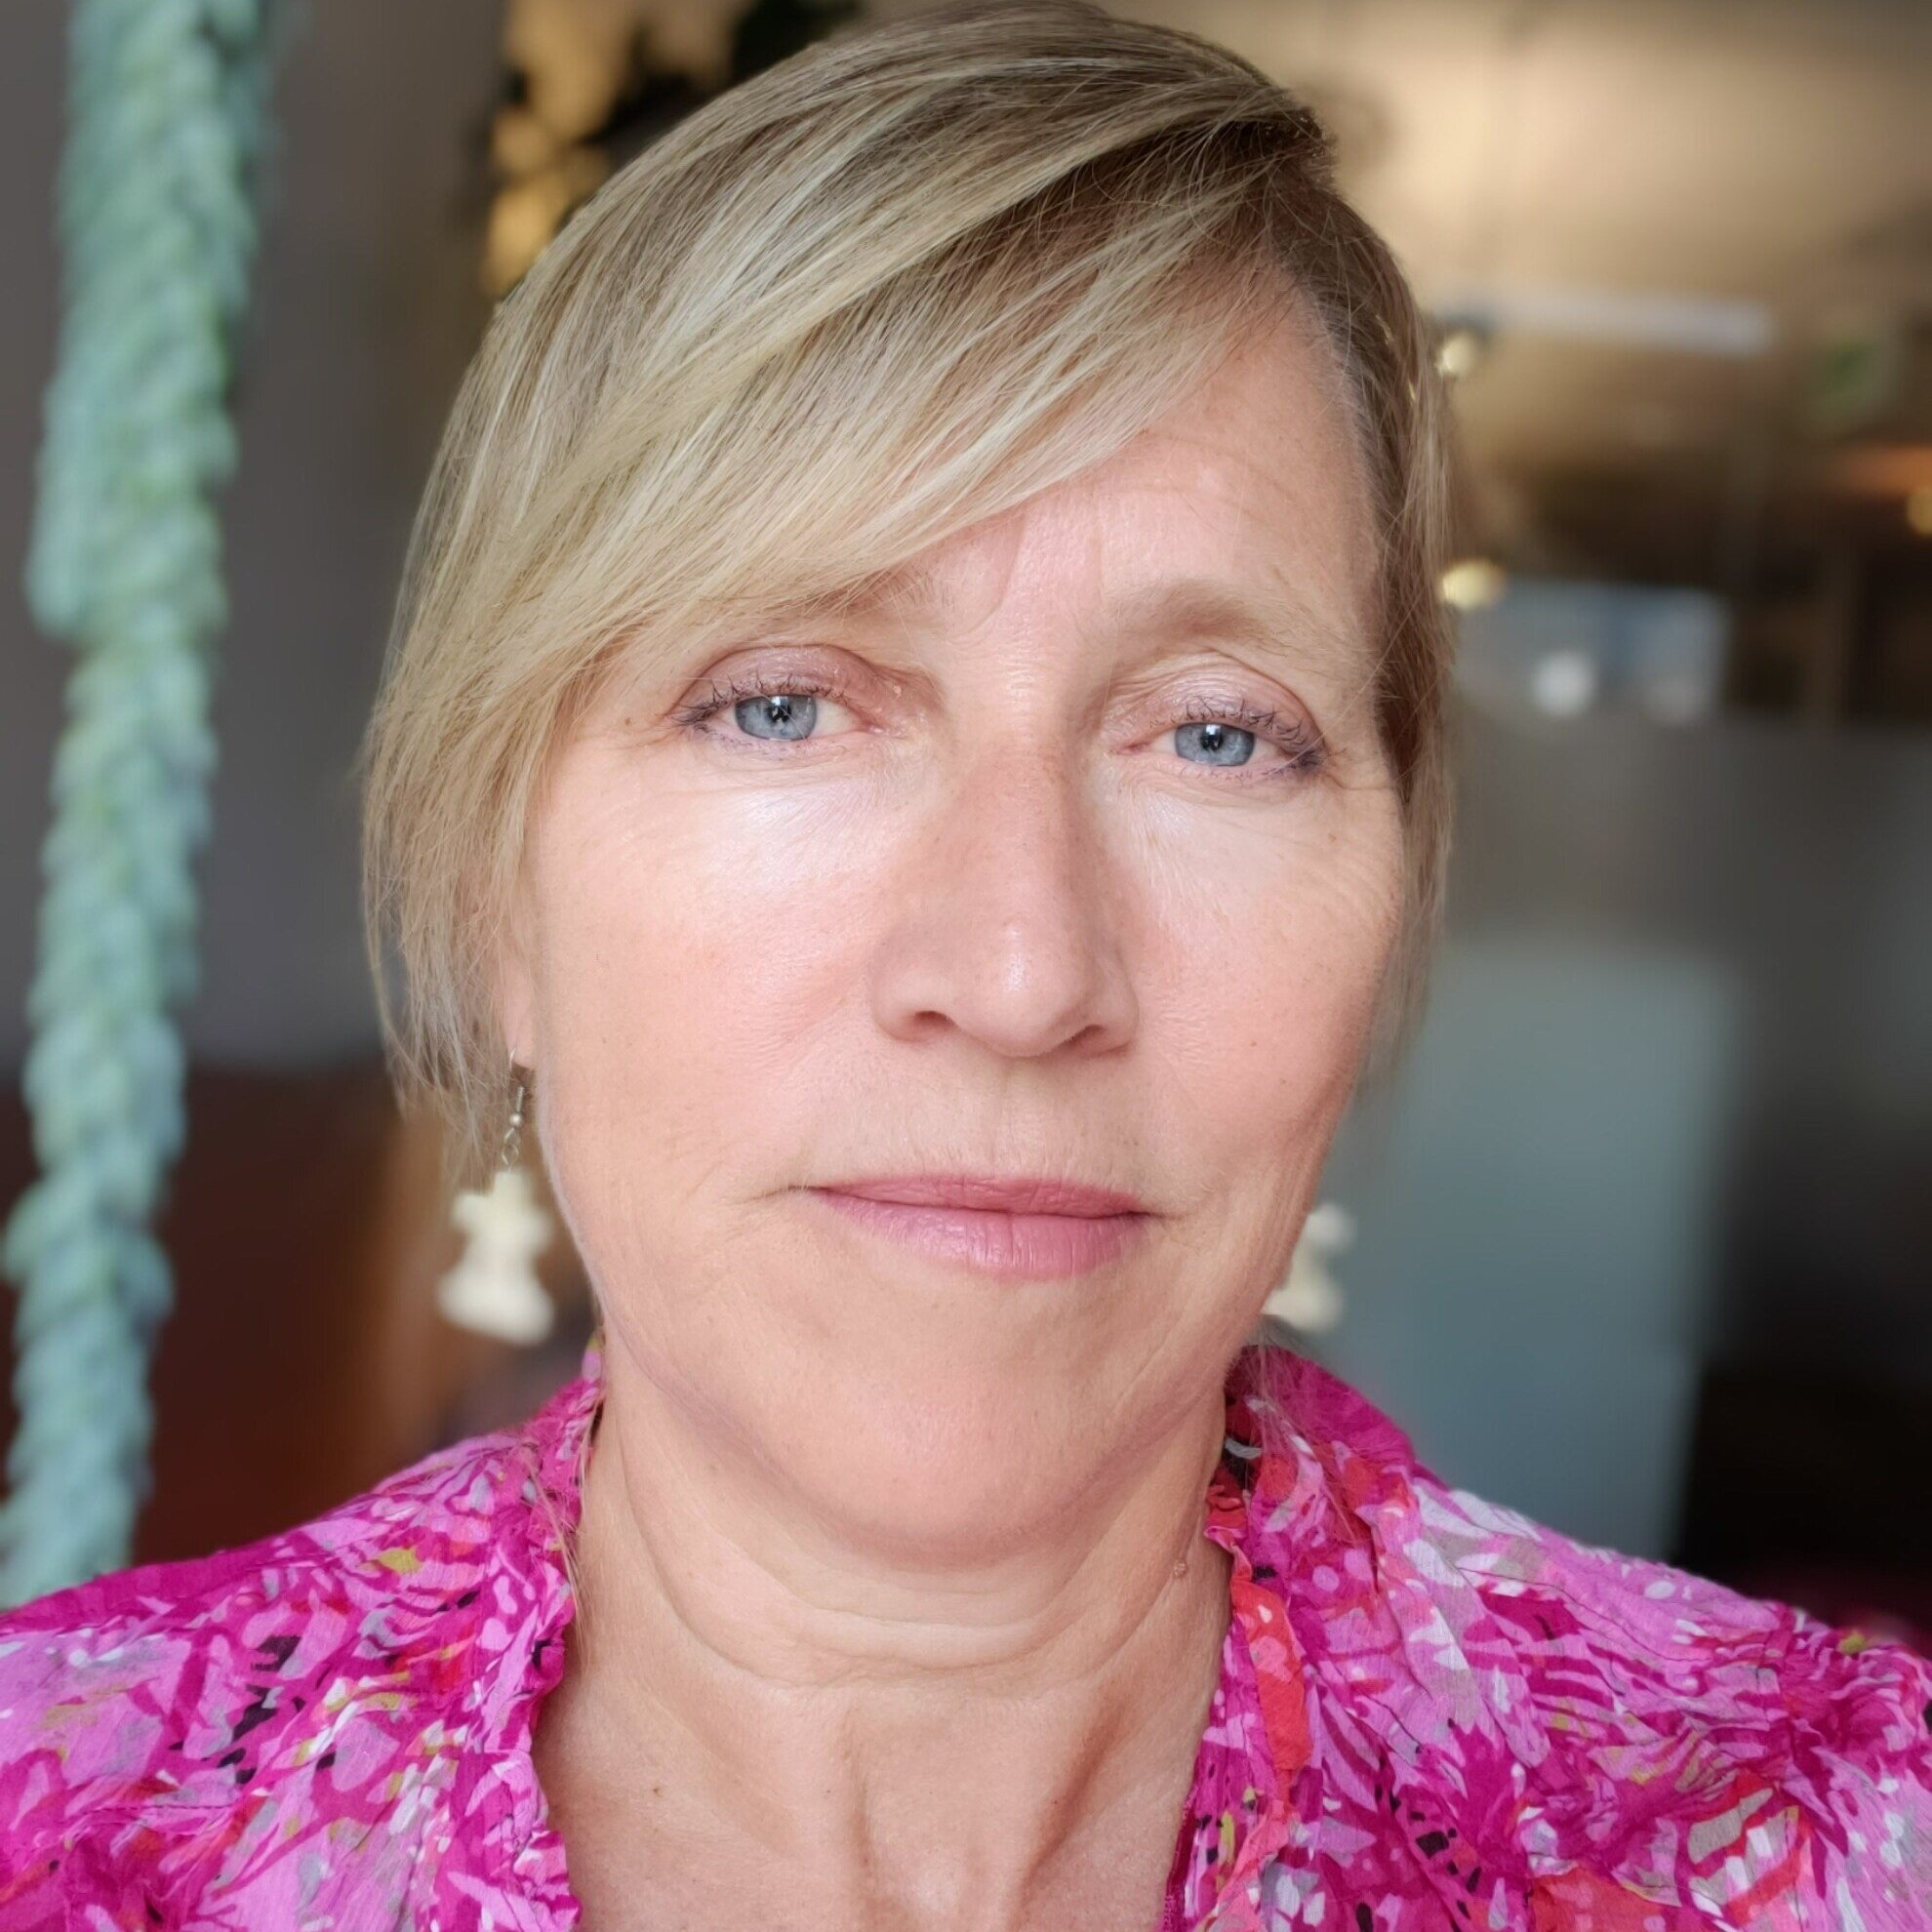 Lori+McCurdy-Telefilm+Feature+Film+Executive+%28Sept+2019%29+%281%29.jpg